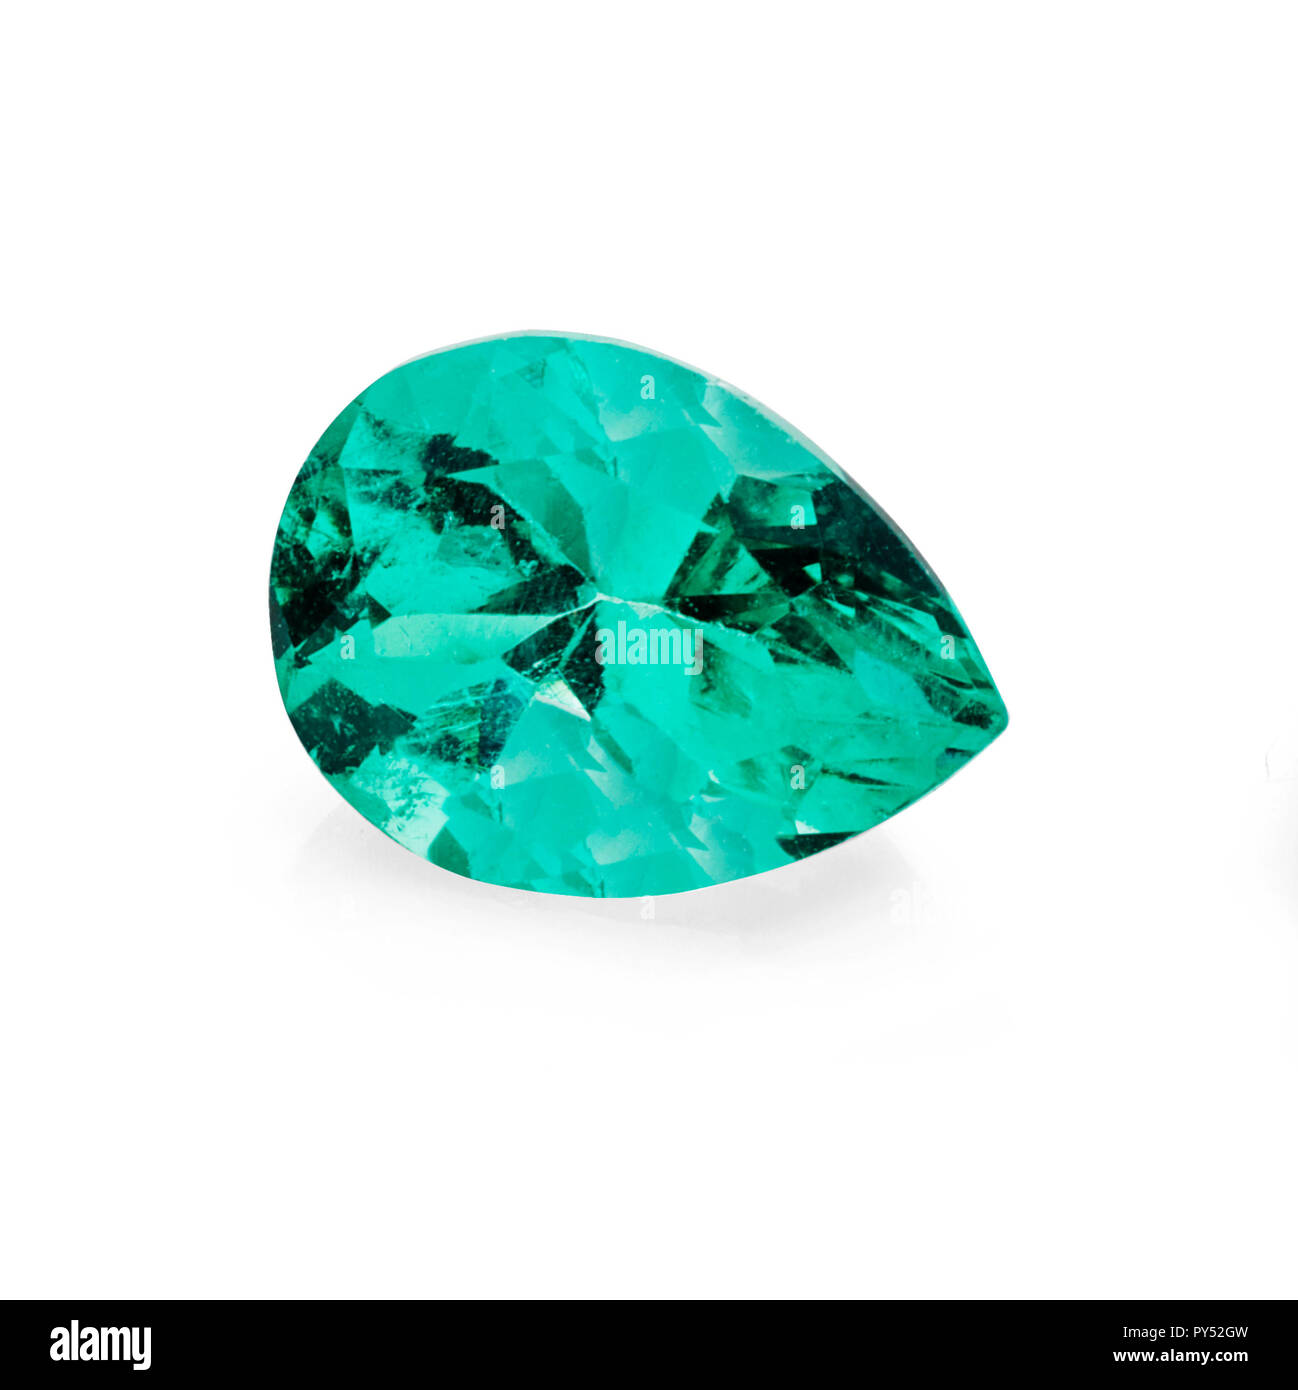 1.23 carat, pear shape cut green emerald gemstone on a white background - Stock Image